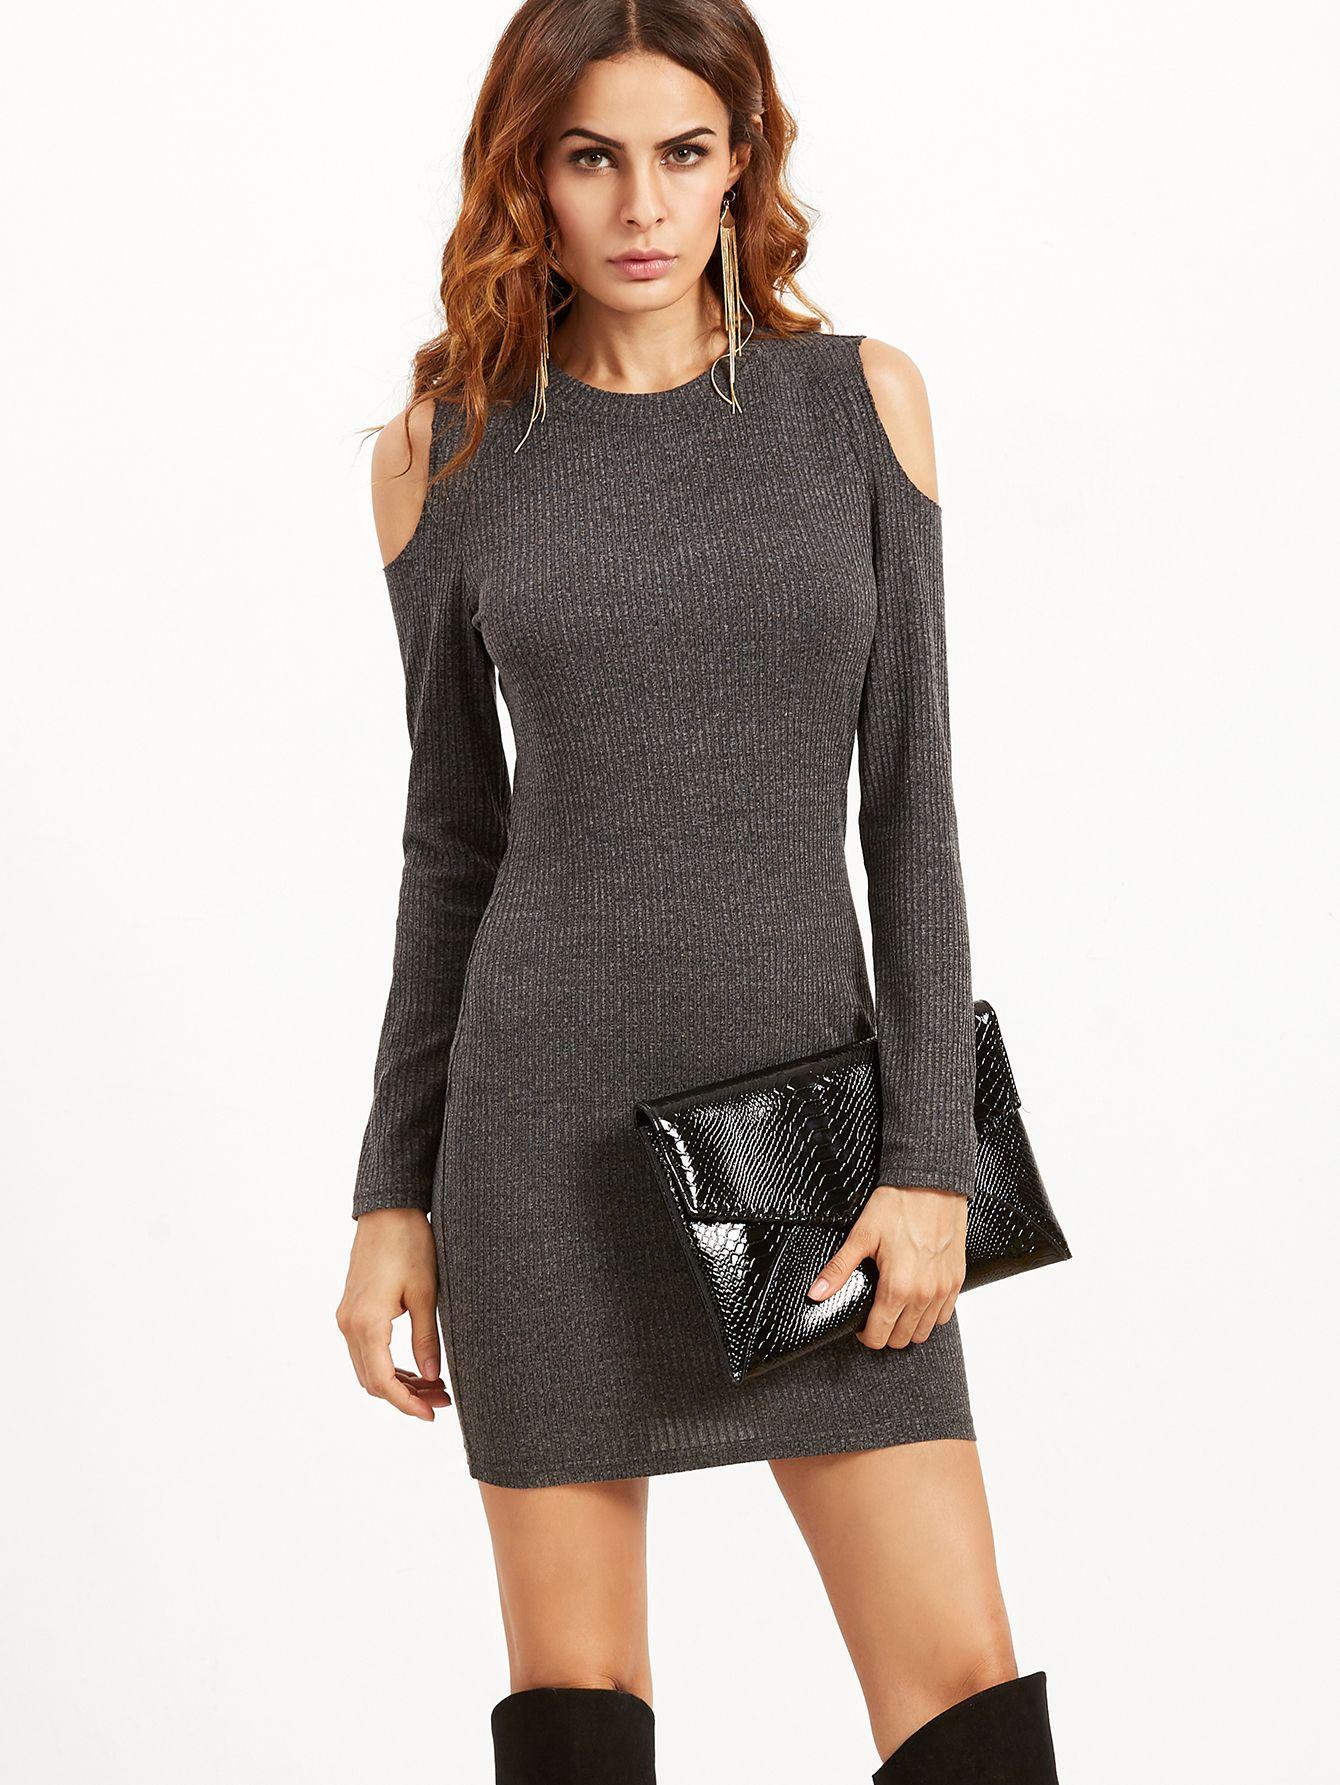 4f0957a9d4ec Shop Grey Open Shoulder Ribbed Bodycon Dress online. SheIn offers Grey Open  Shoulder Ribbed Bodycon